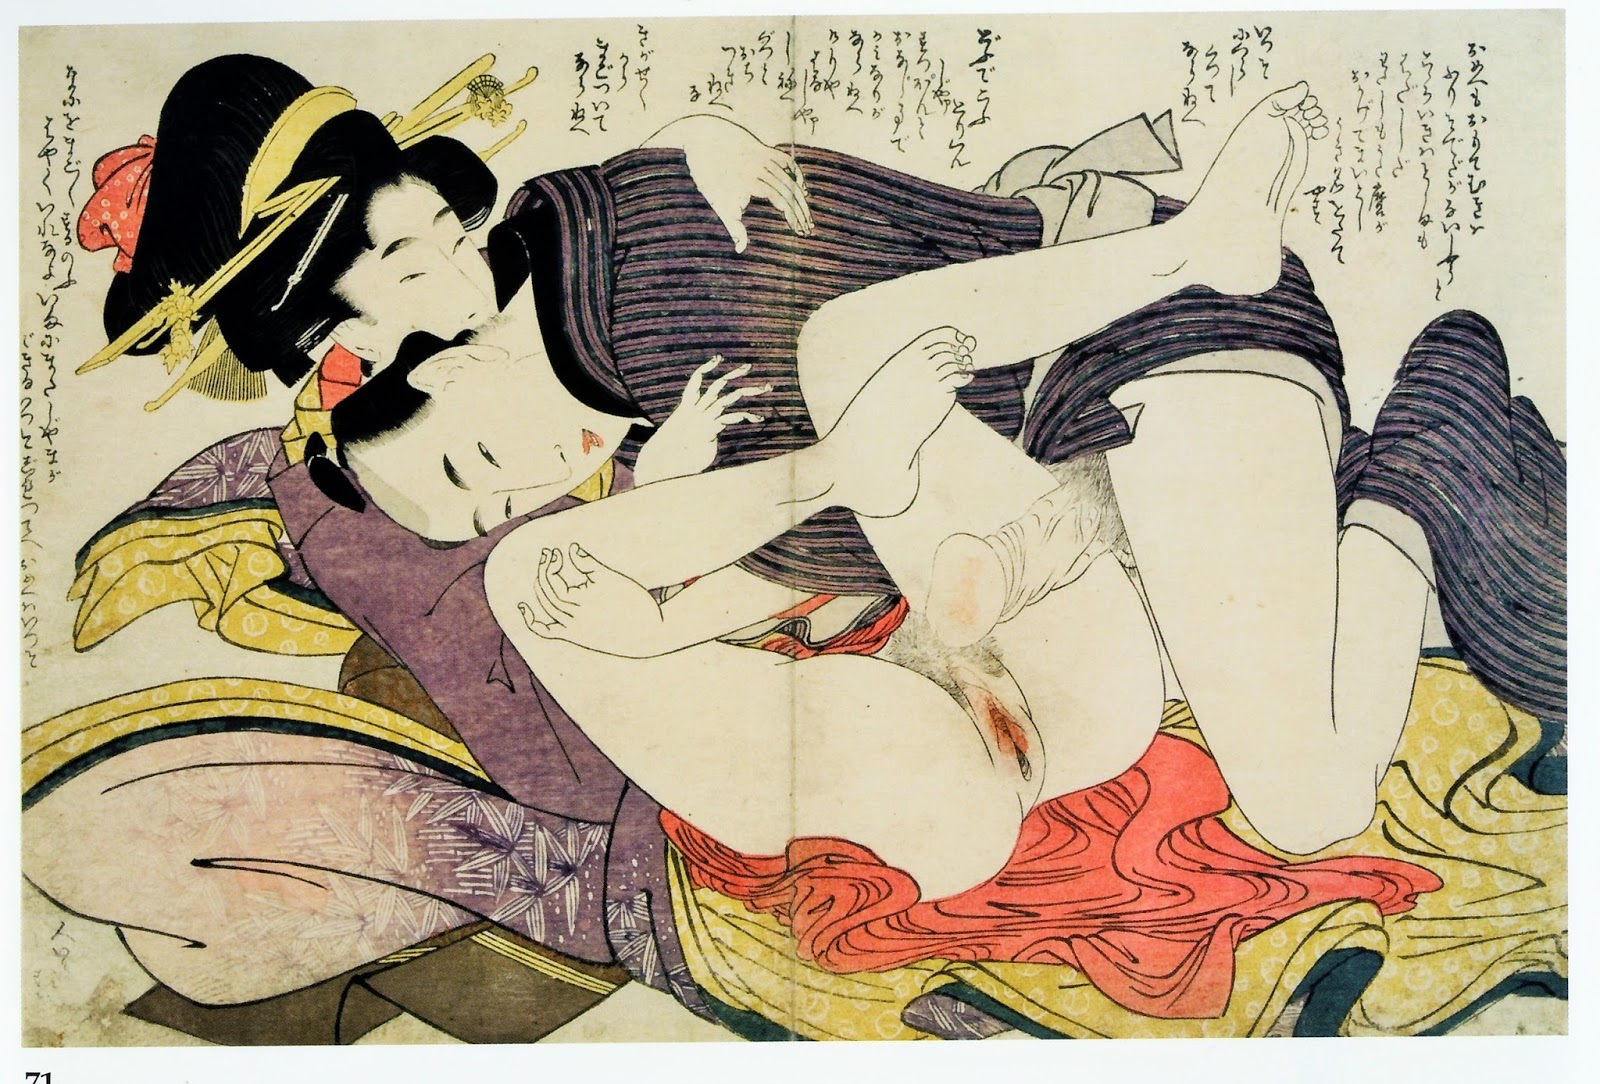 Original japanese woodblock print ukiyoe erotic shunga meiji era shin hanga gallery